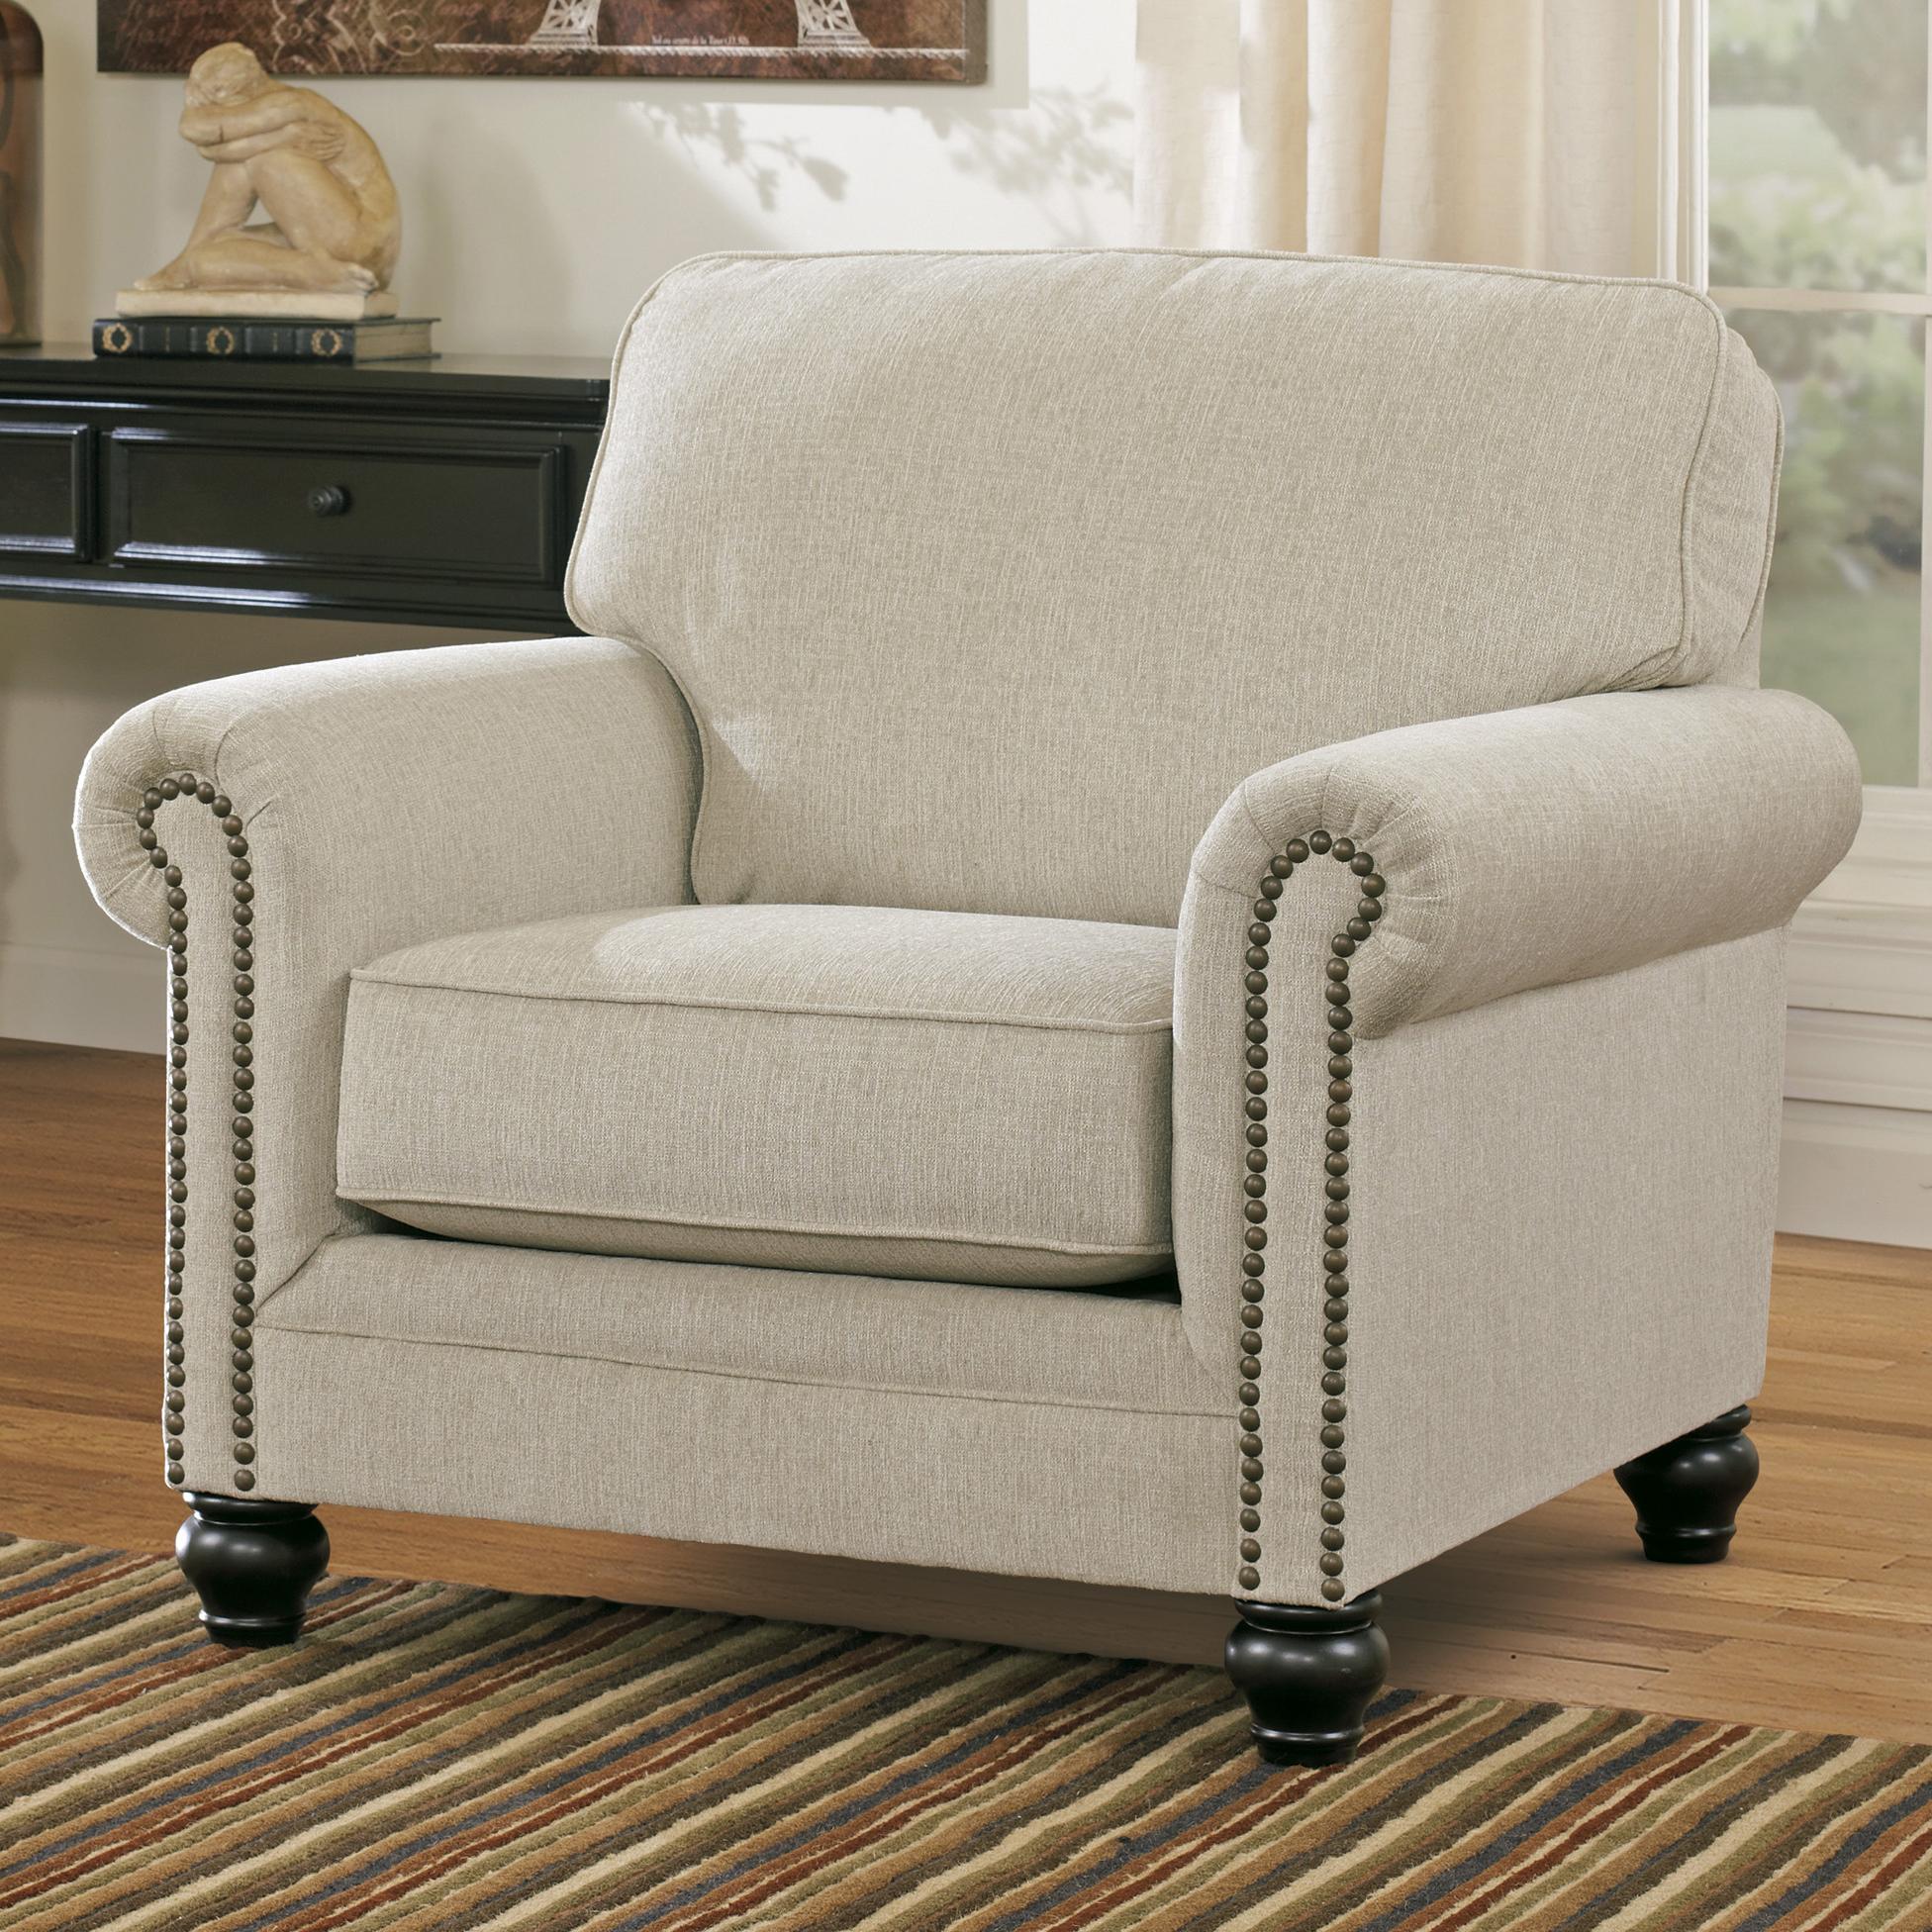 Milari - Linen Chair by Ashley (Signature Design) at Johnny Janosik